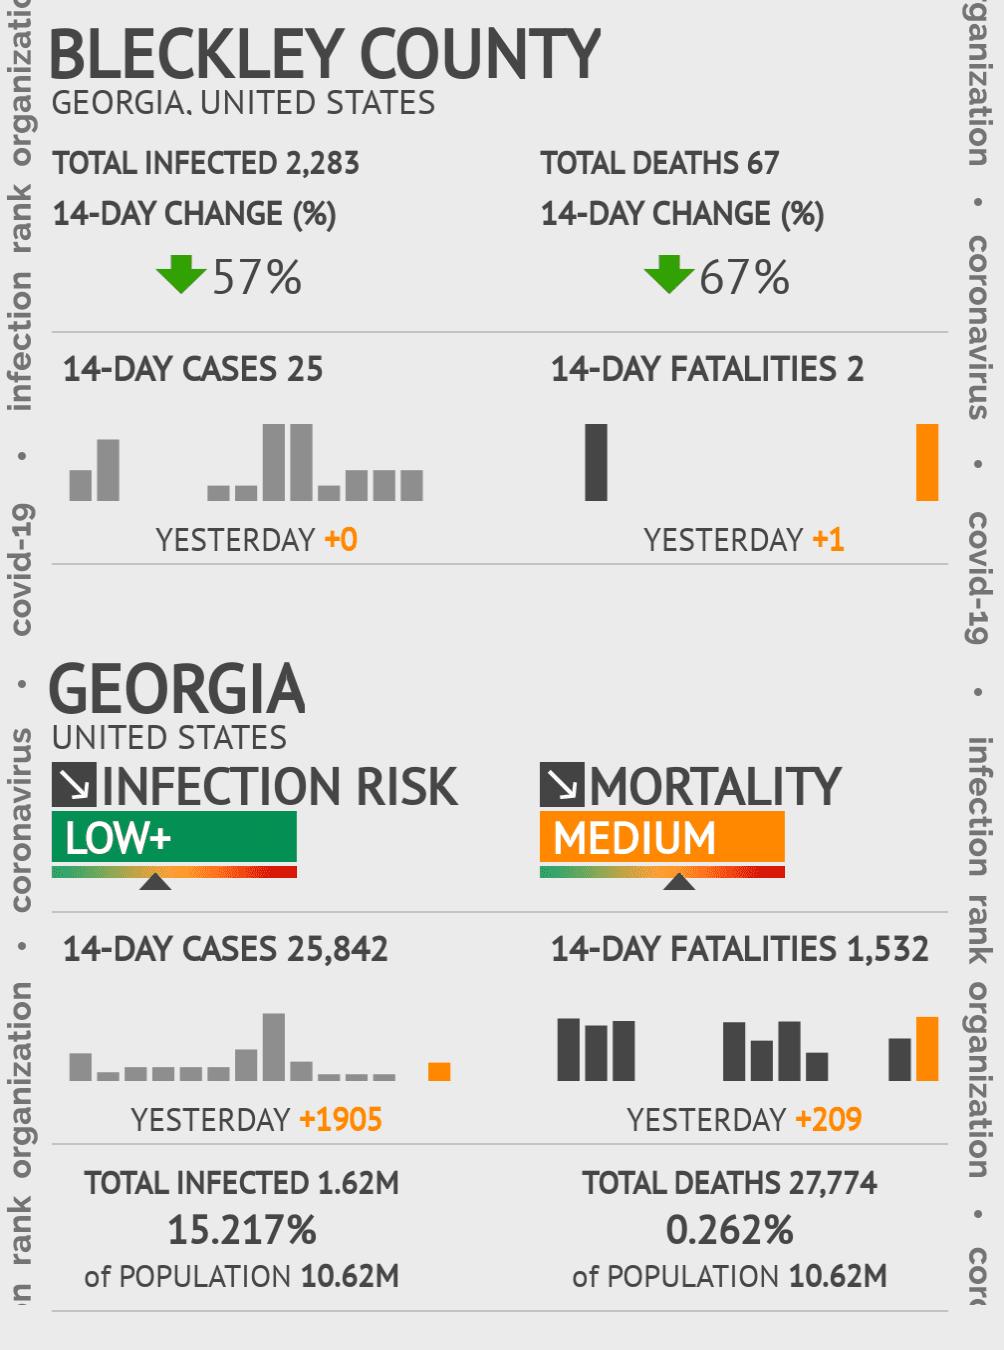 Bleckley County Coronavirus Covid-19 Risk of Infection on November 27, 2020